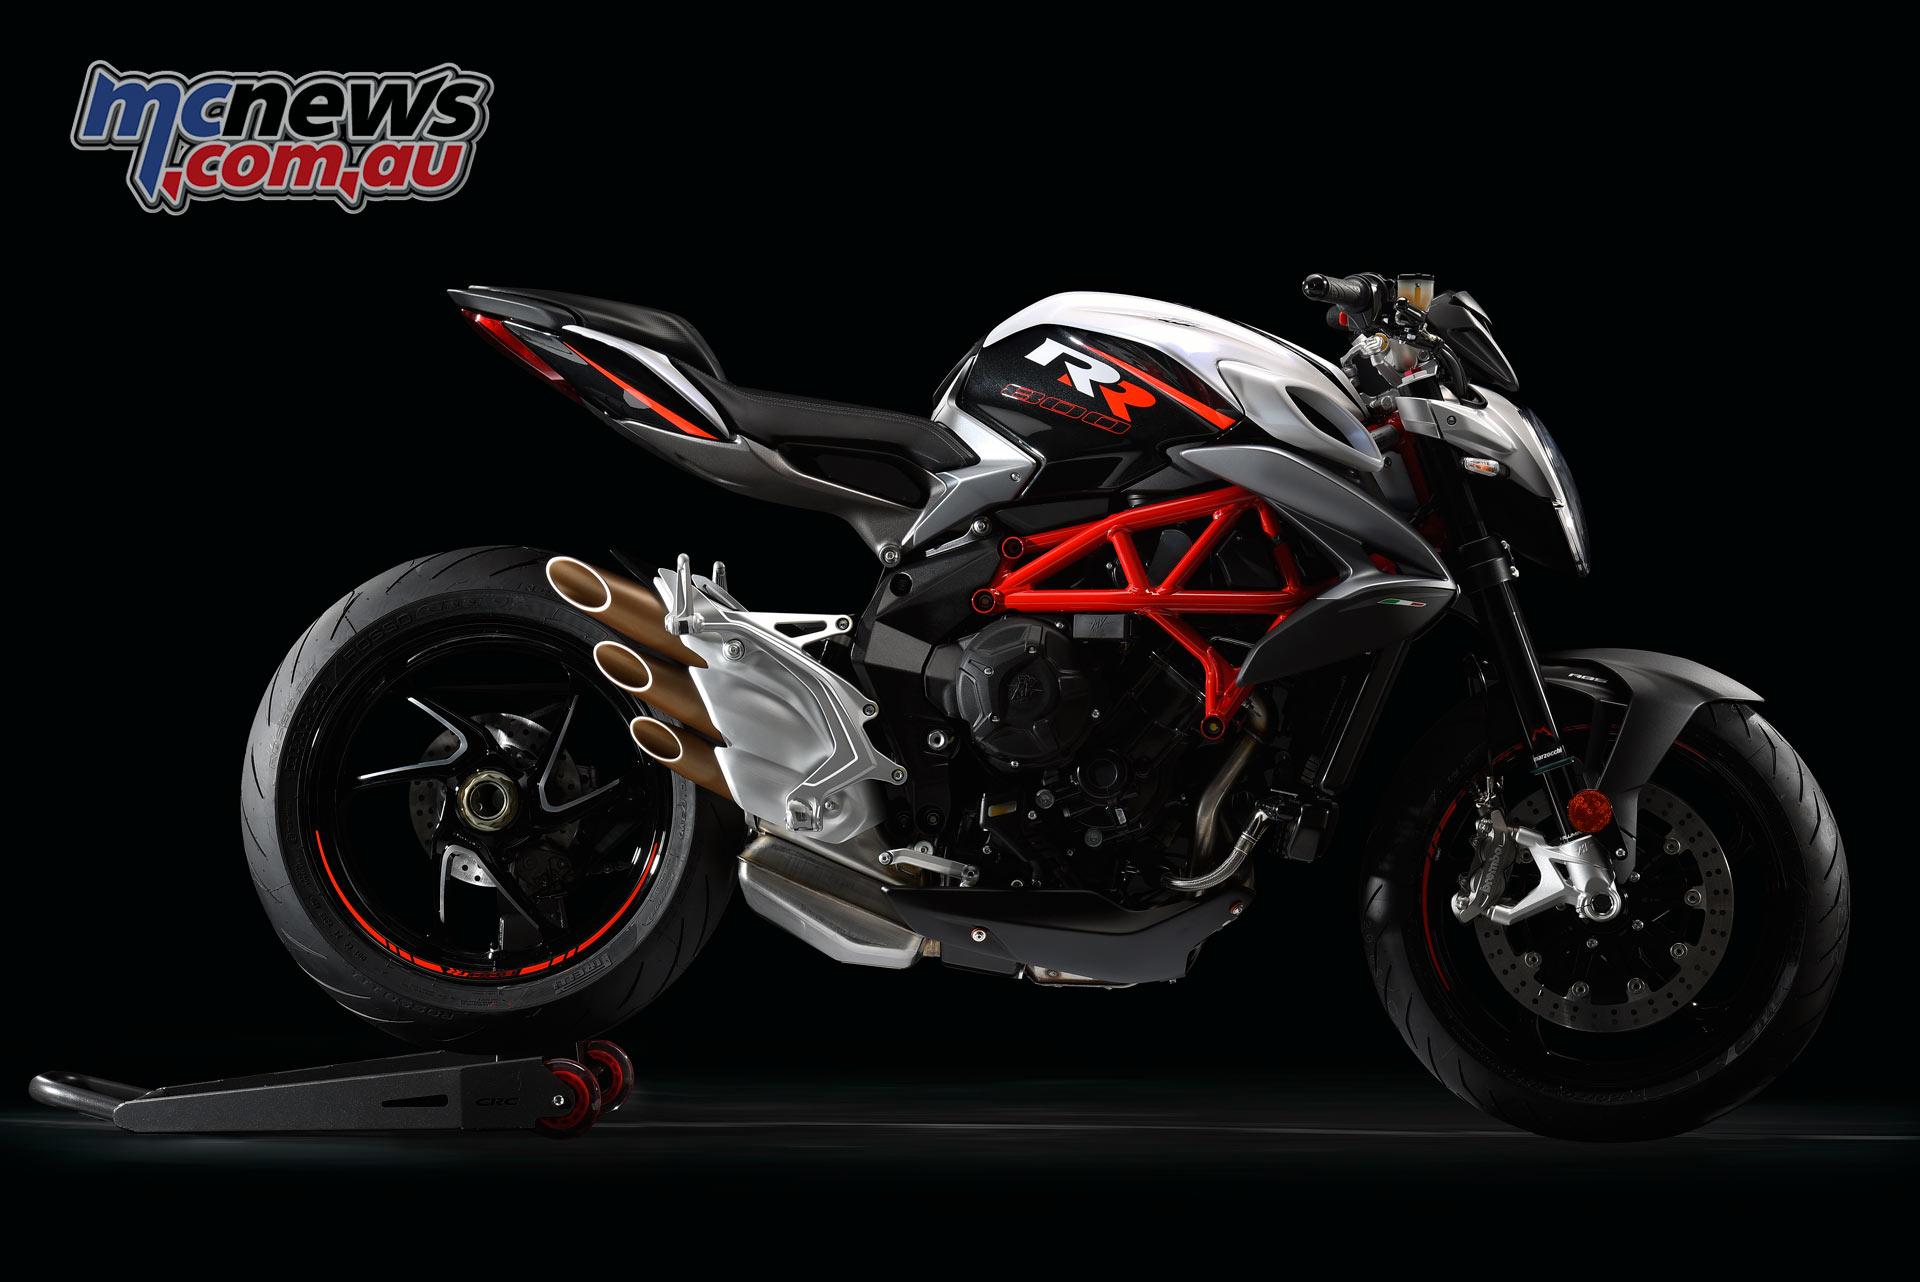 Wallpaper Mv Agusta Brutale 800 2017 Automotive Bikes: MV Agusta Reveal 2017 Brutale 800 RR At EICMA